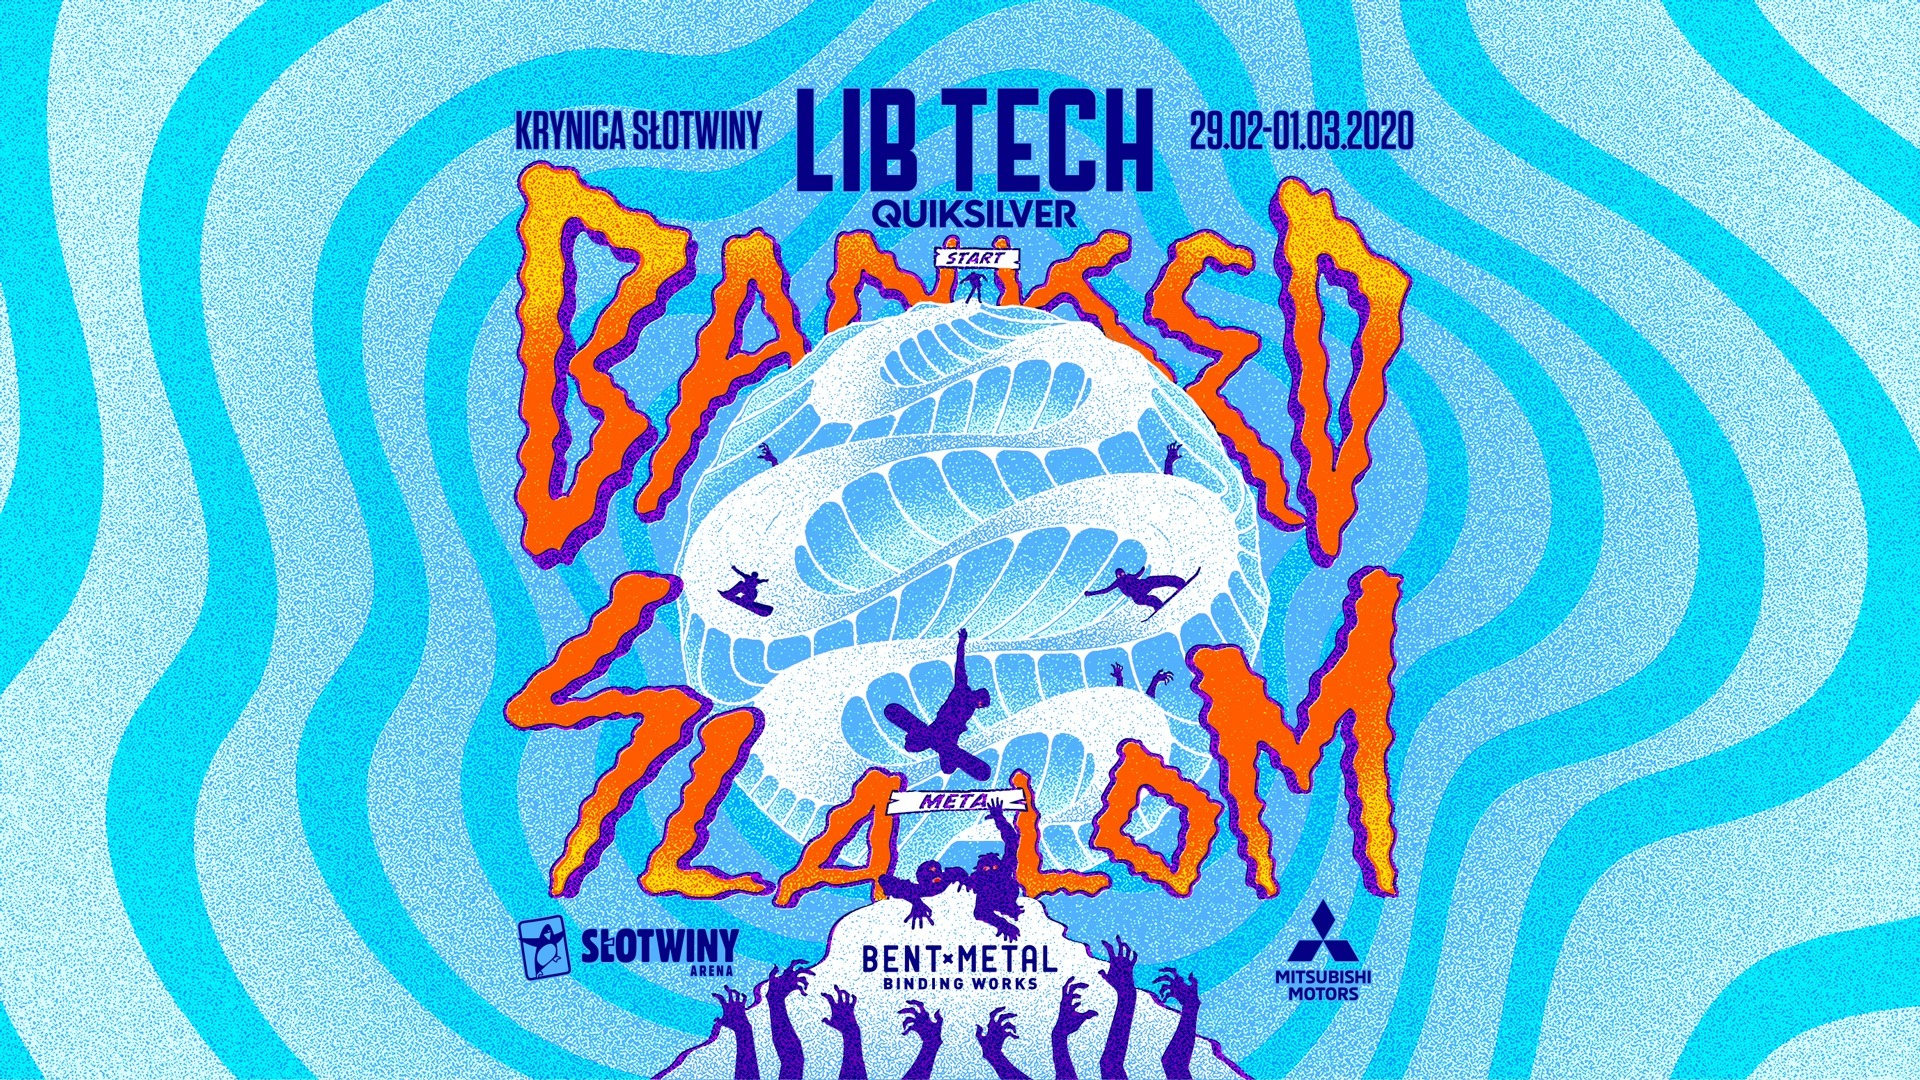 Lib Tech/Quiksilver Banked Slalom 2020